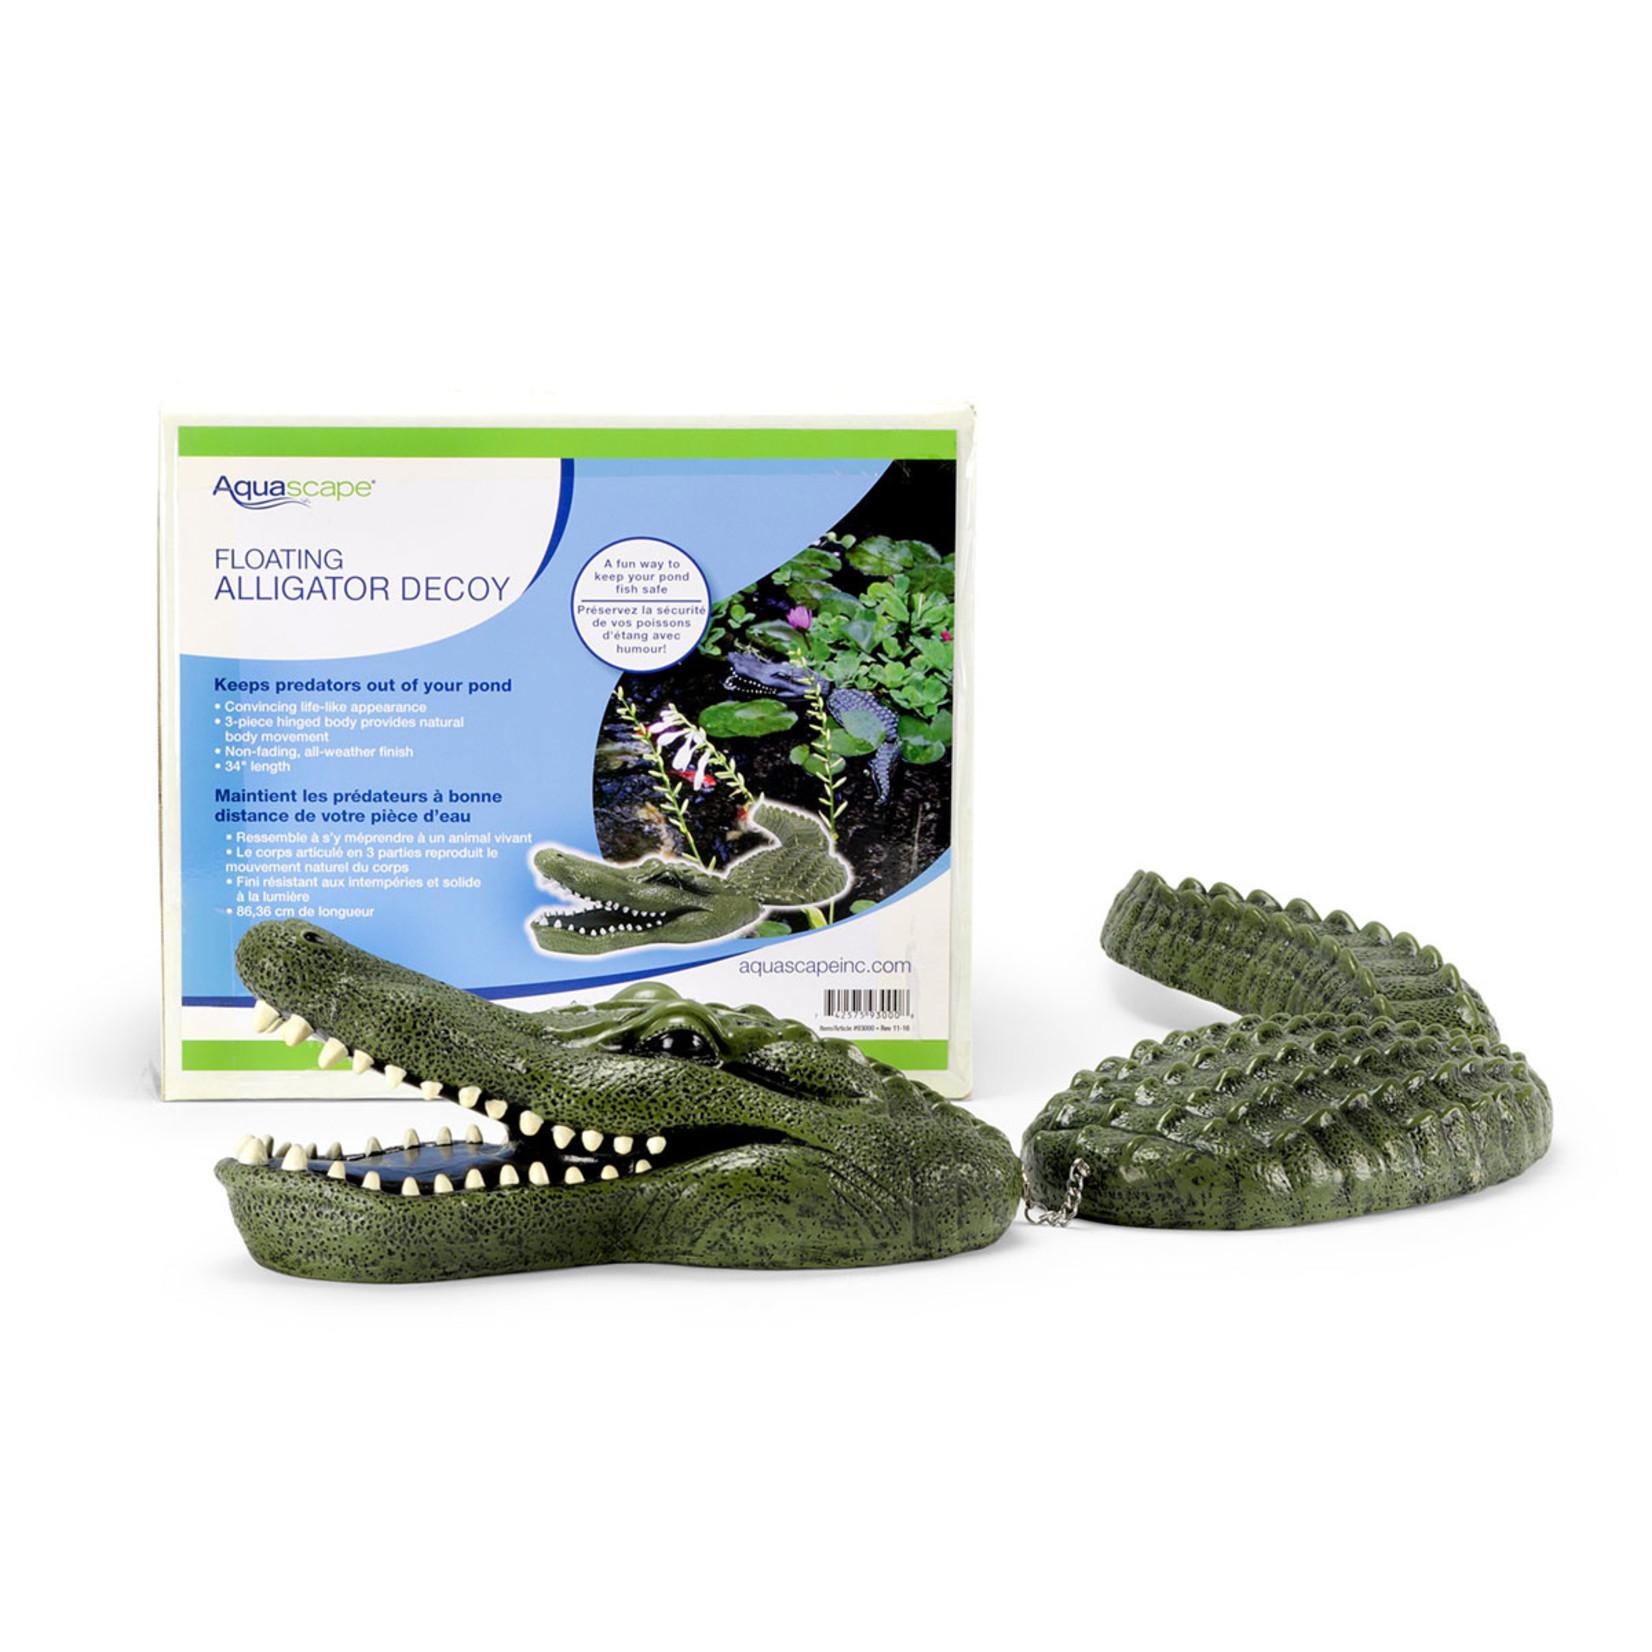 Aquascape Alligator Decoy/Flottant